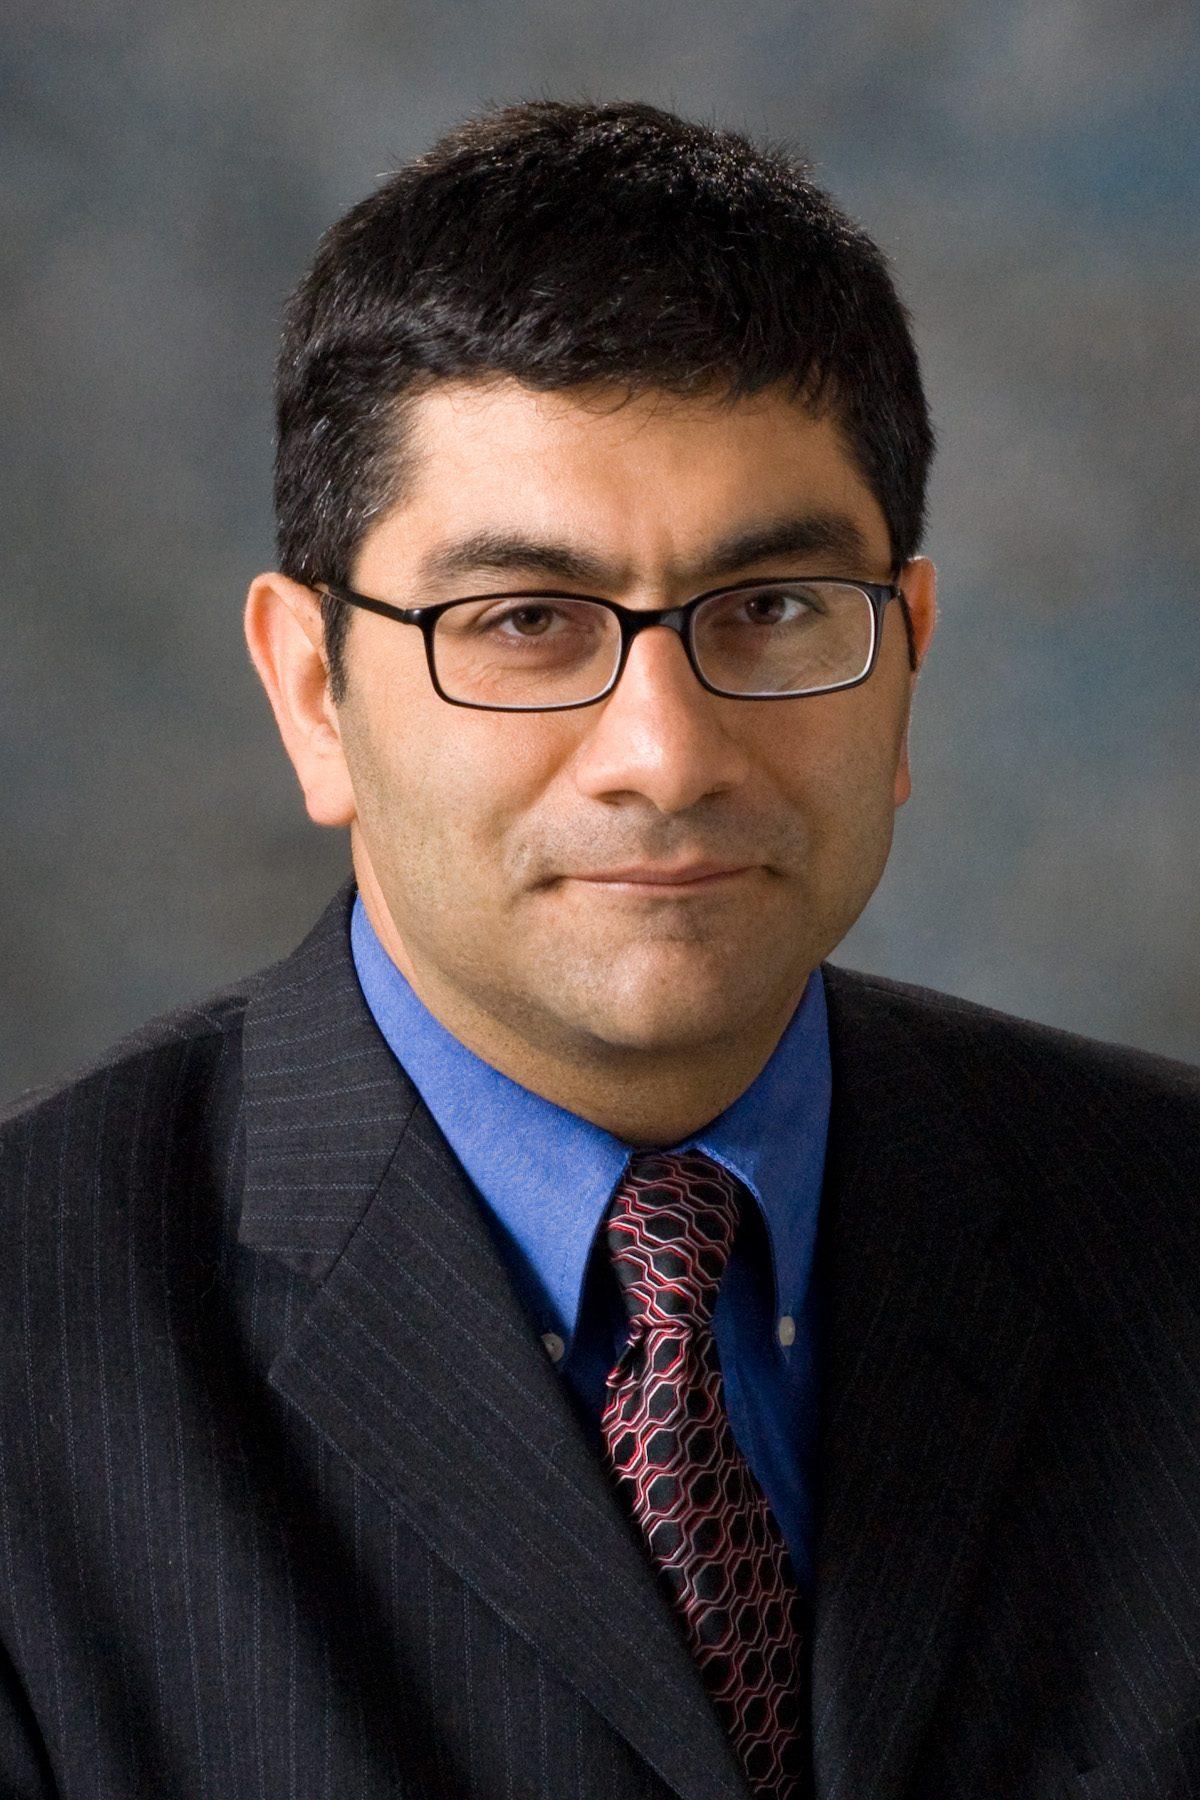 Vahid Afshar-Kharghan | MD Anderson Cancer Center